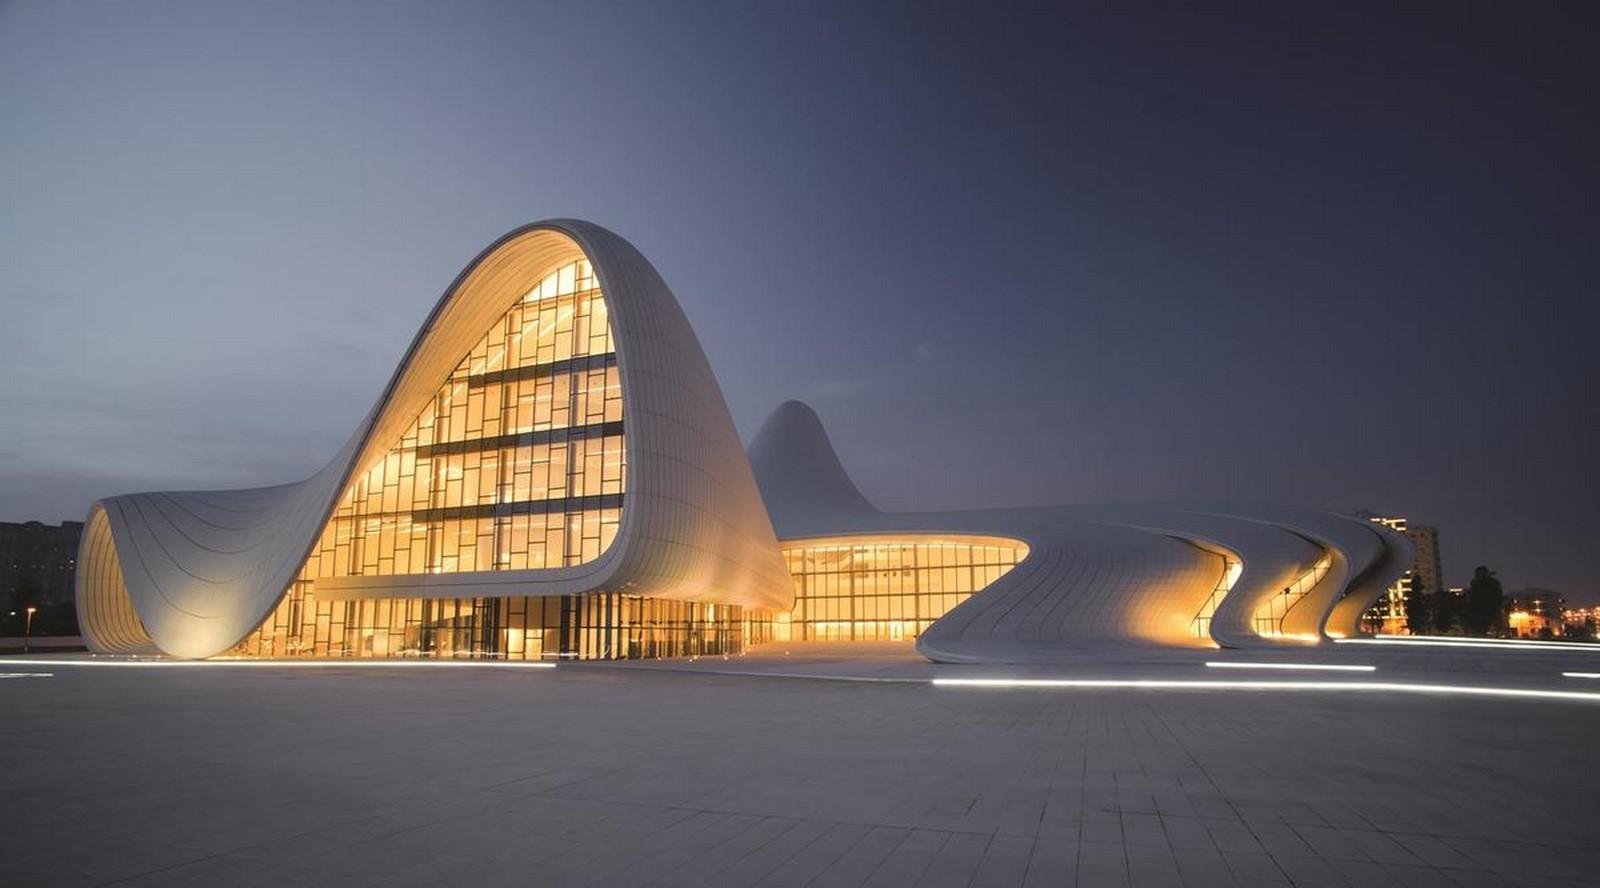 Heydar Aliyev Centre by Zaha Hadid: Incredibly Ambitious Project - Sheet1